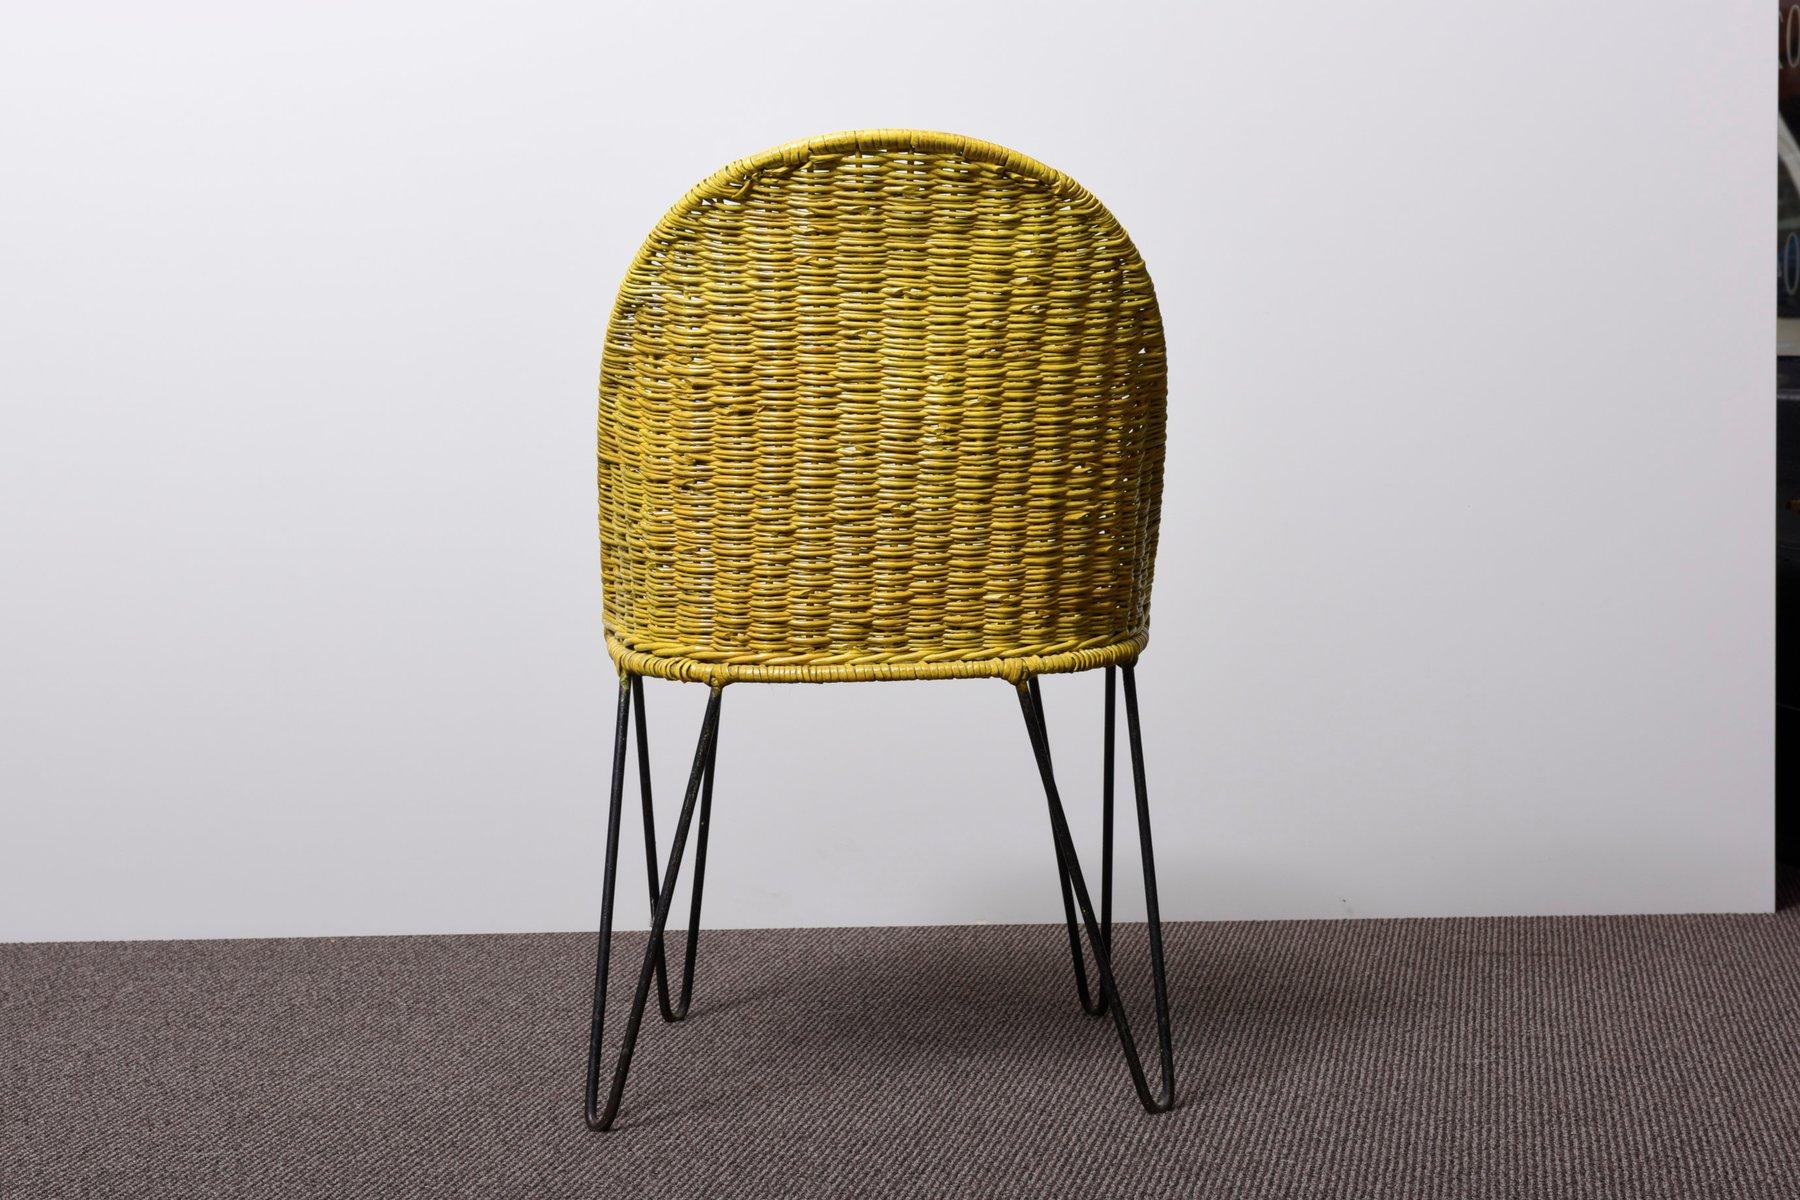 rattan gartenm bel 1980er bei pamono kaufen. Black Bedroom Furniture Sets. Home Design Ideas